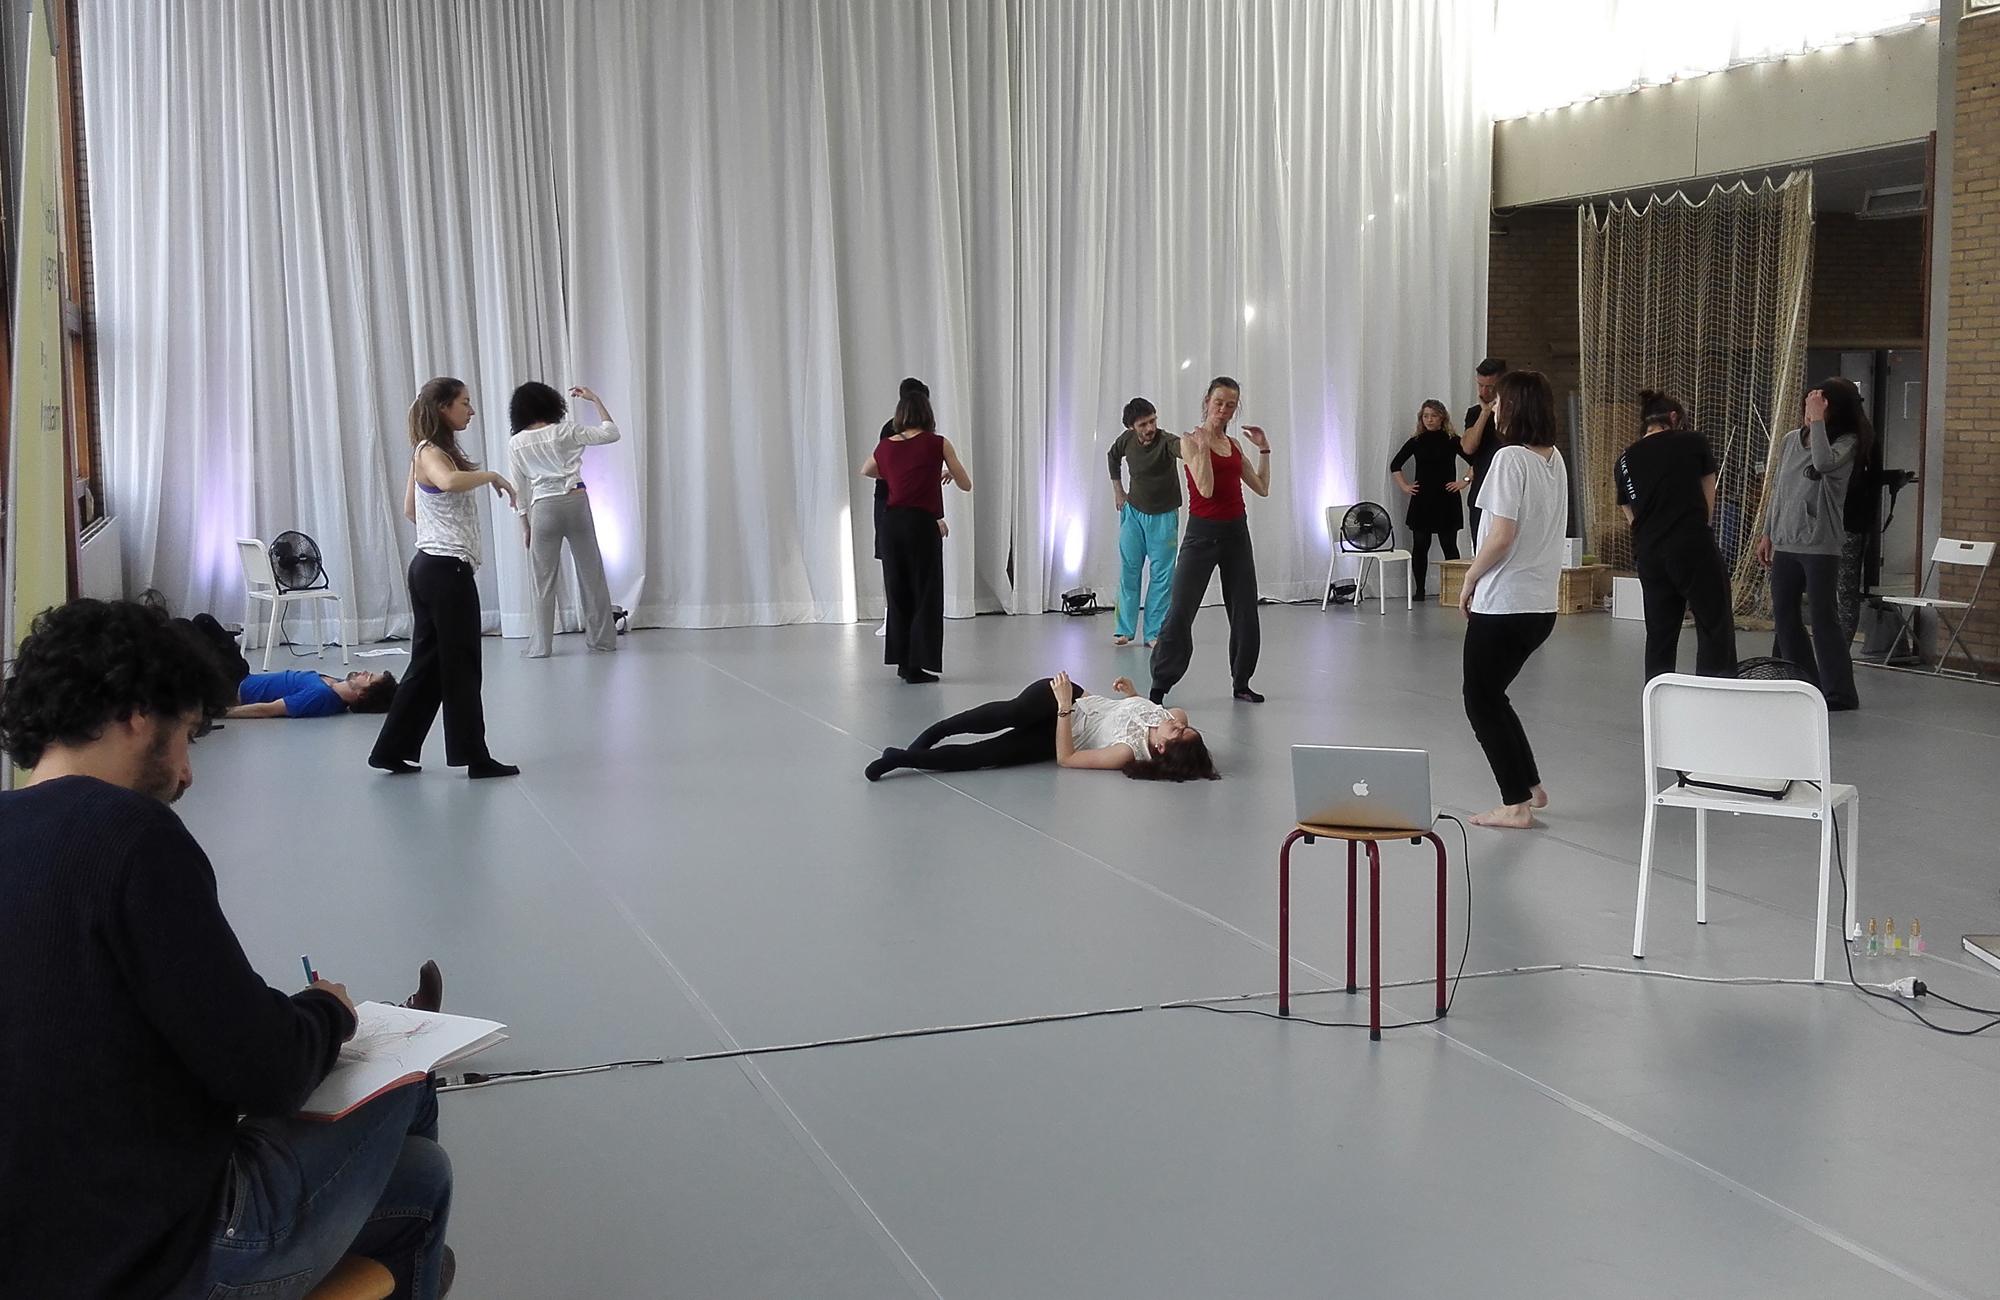 Voorkeur Dance studio rental • ICK FP-49